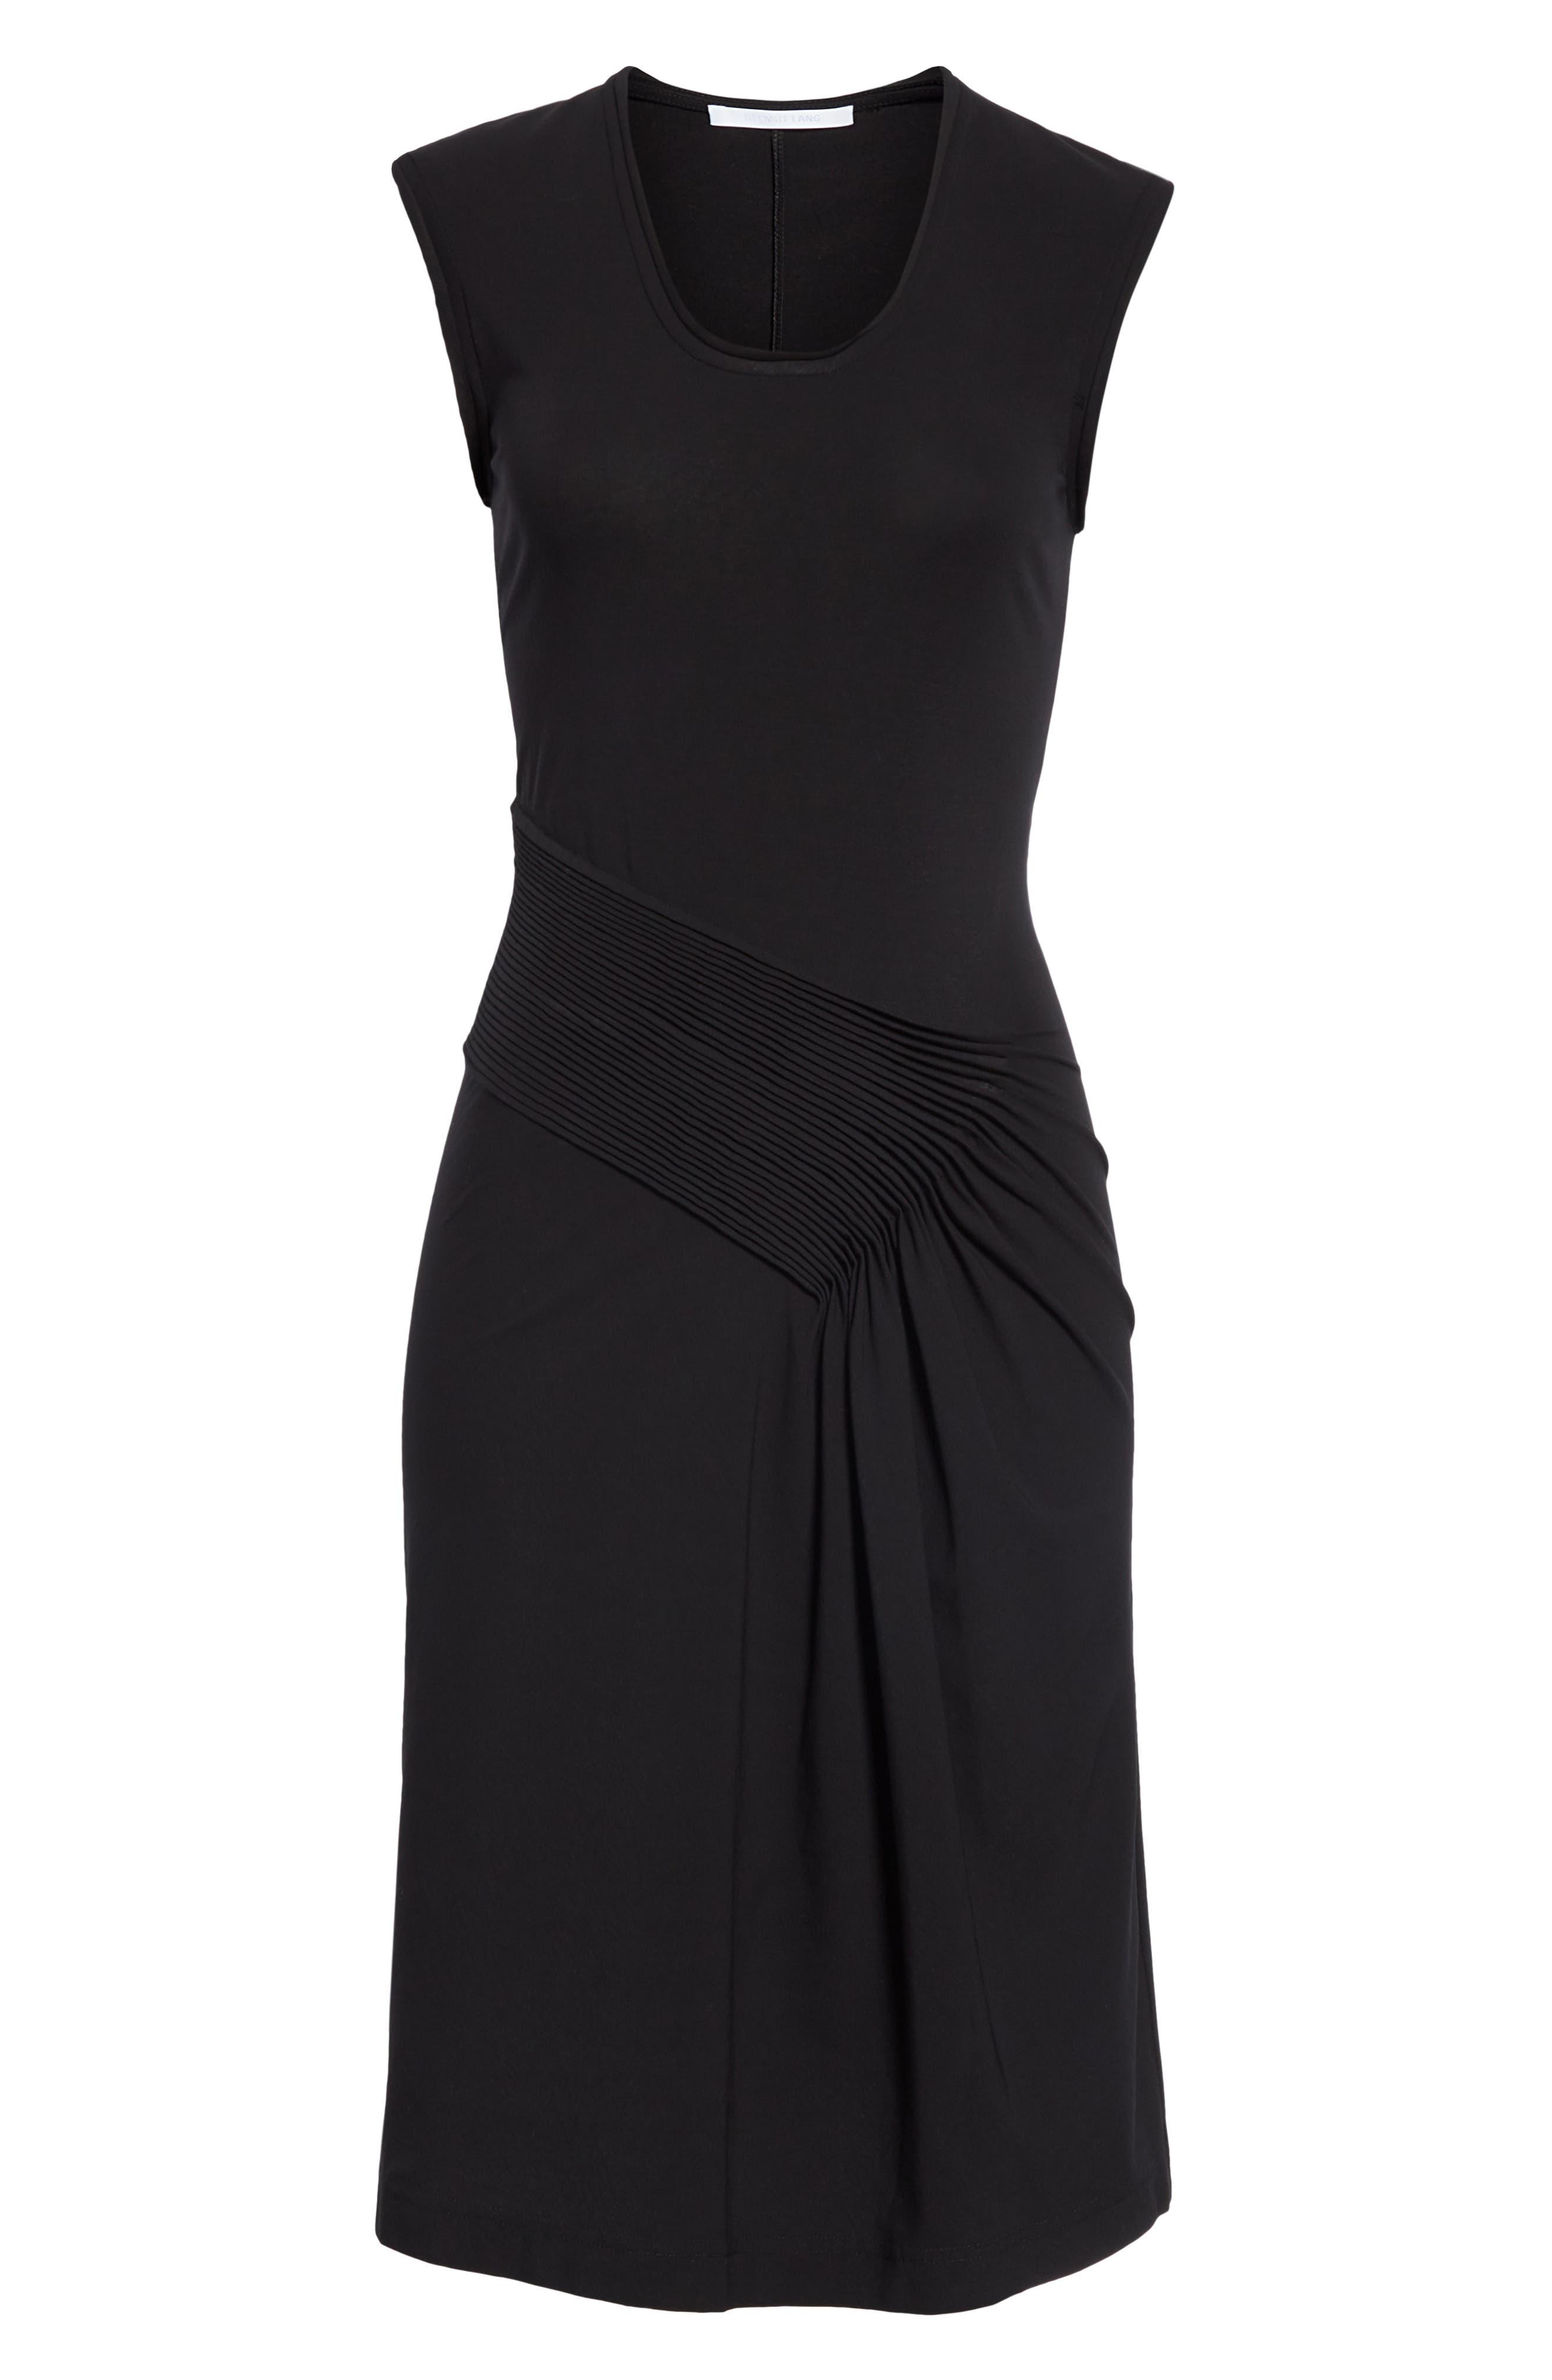 HELMUT LANG, Pleated Jersey Dress, Alternate thumbnail 7, color, BLACK